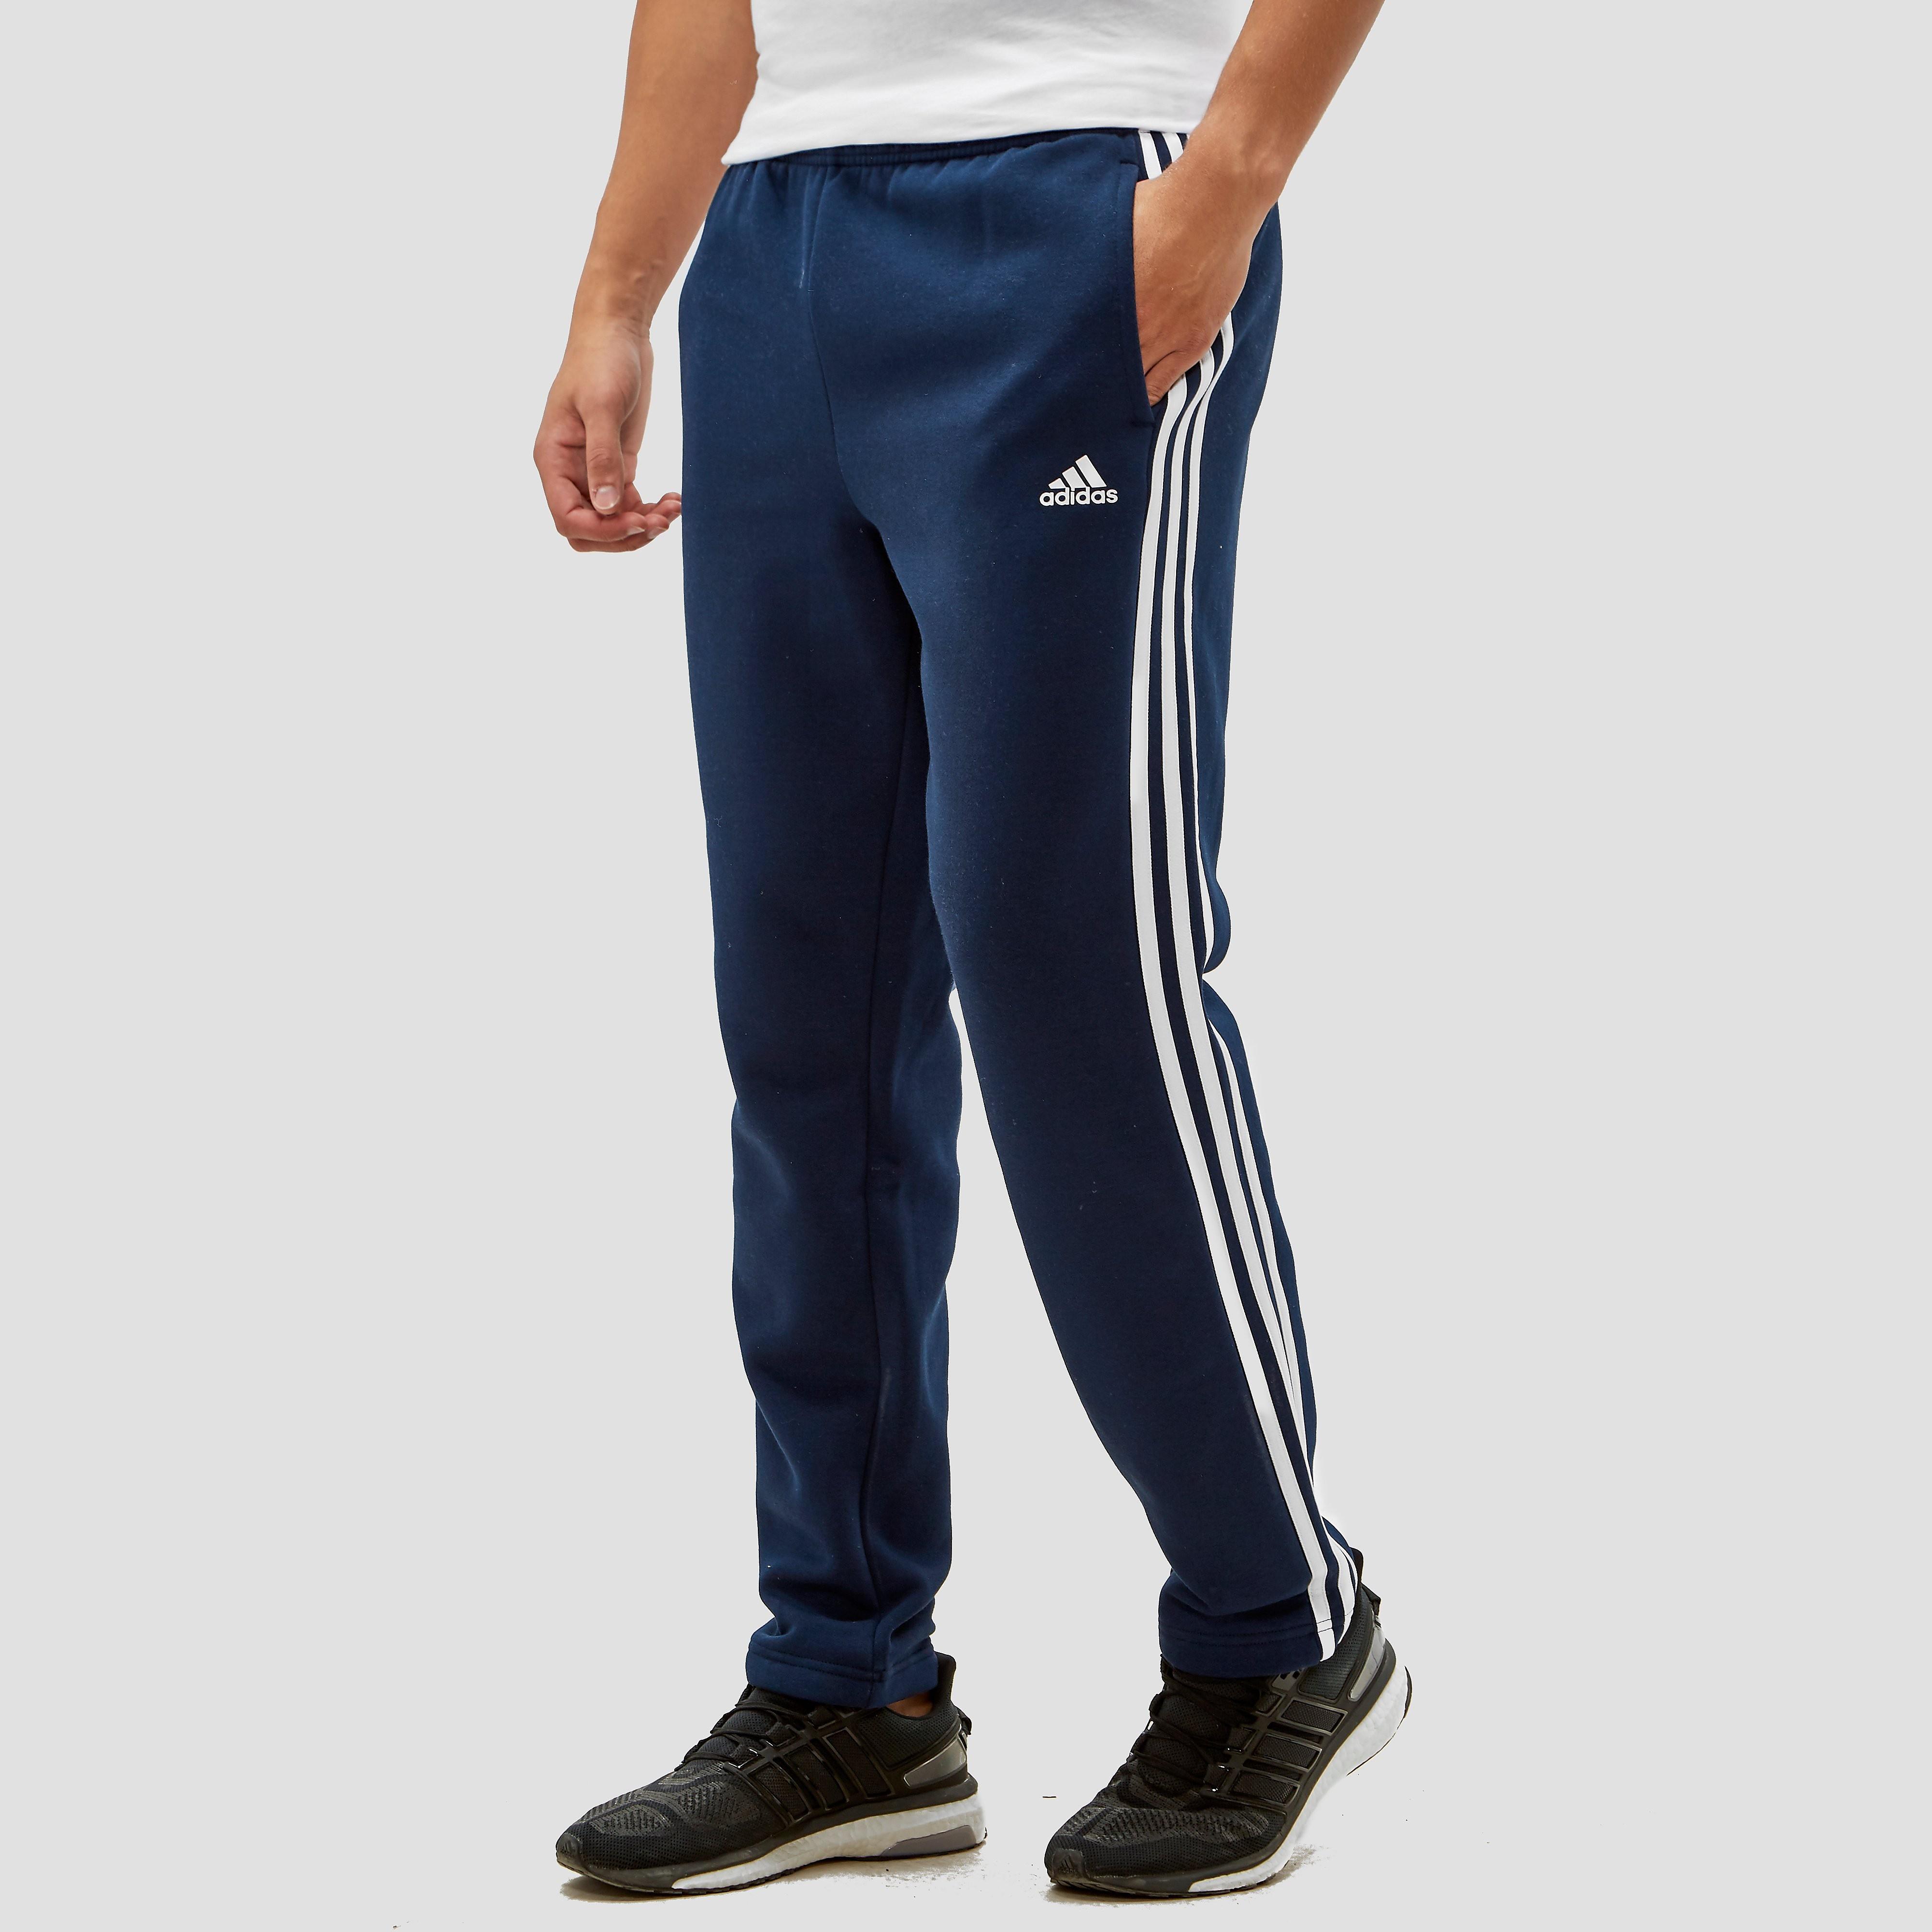 NU 15% KORTING: ADIDAS PERFORMANCE joggingbroek »ESSENTIALS 3S TAPERED FLEECE PANT«